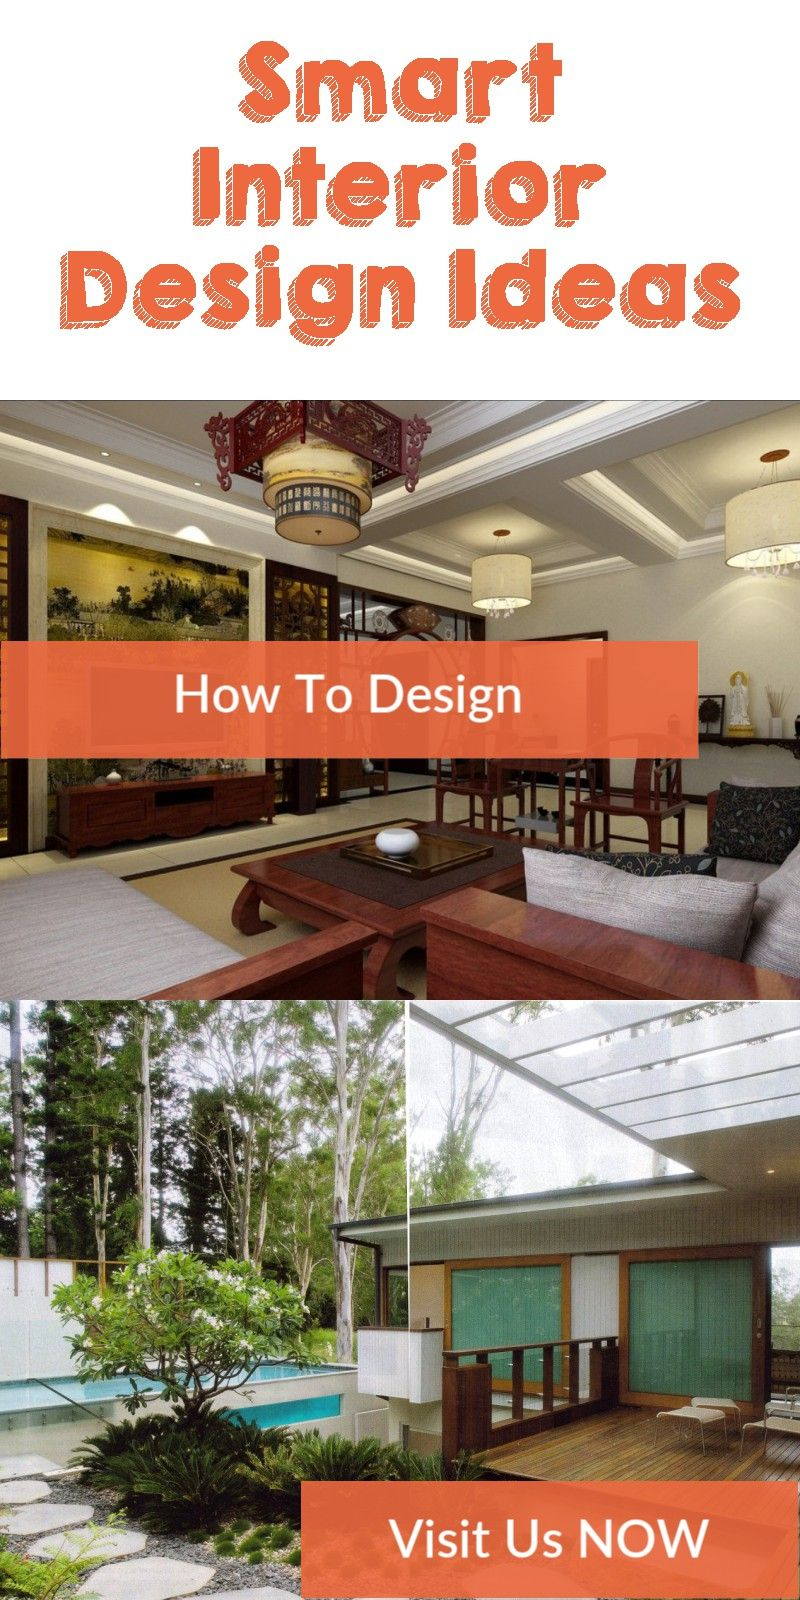 Interior Design Ideas Home Interior Design Tips From The Pros